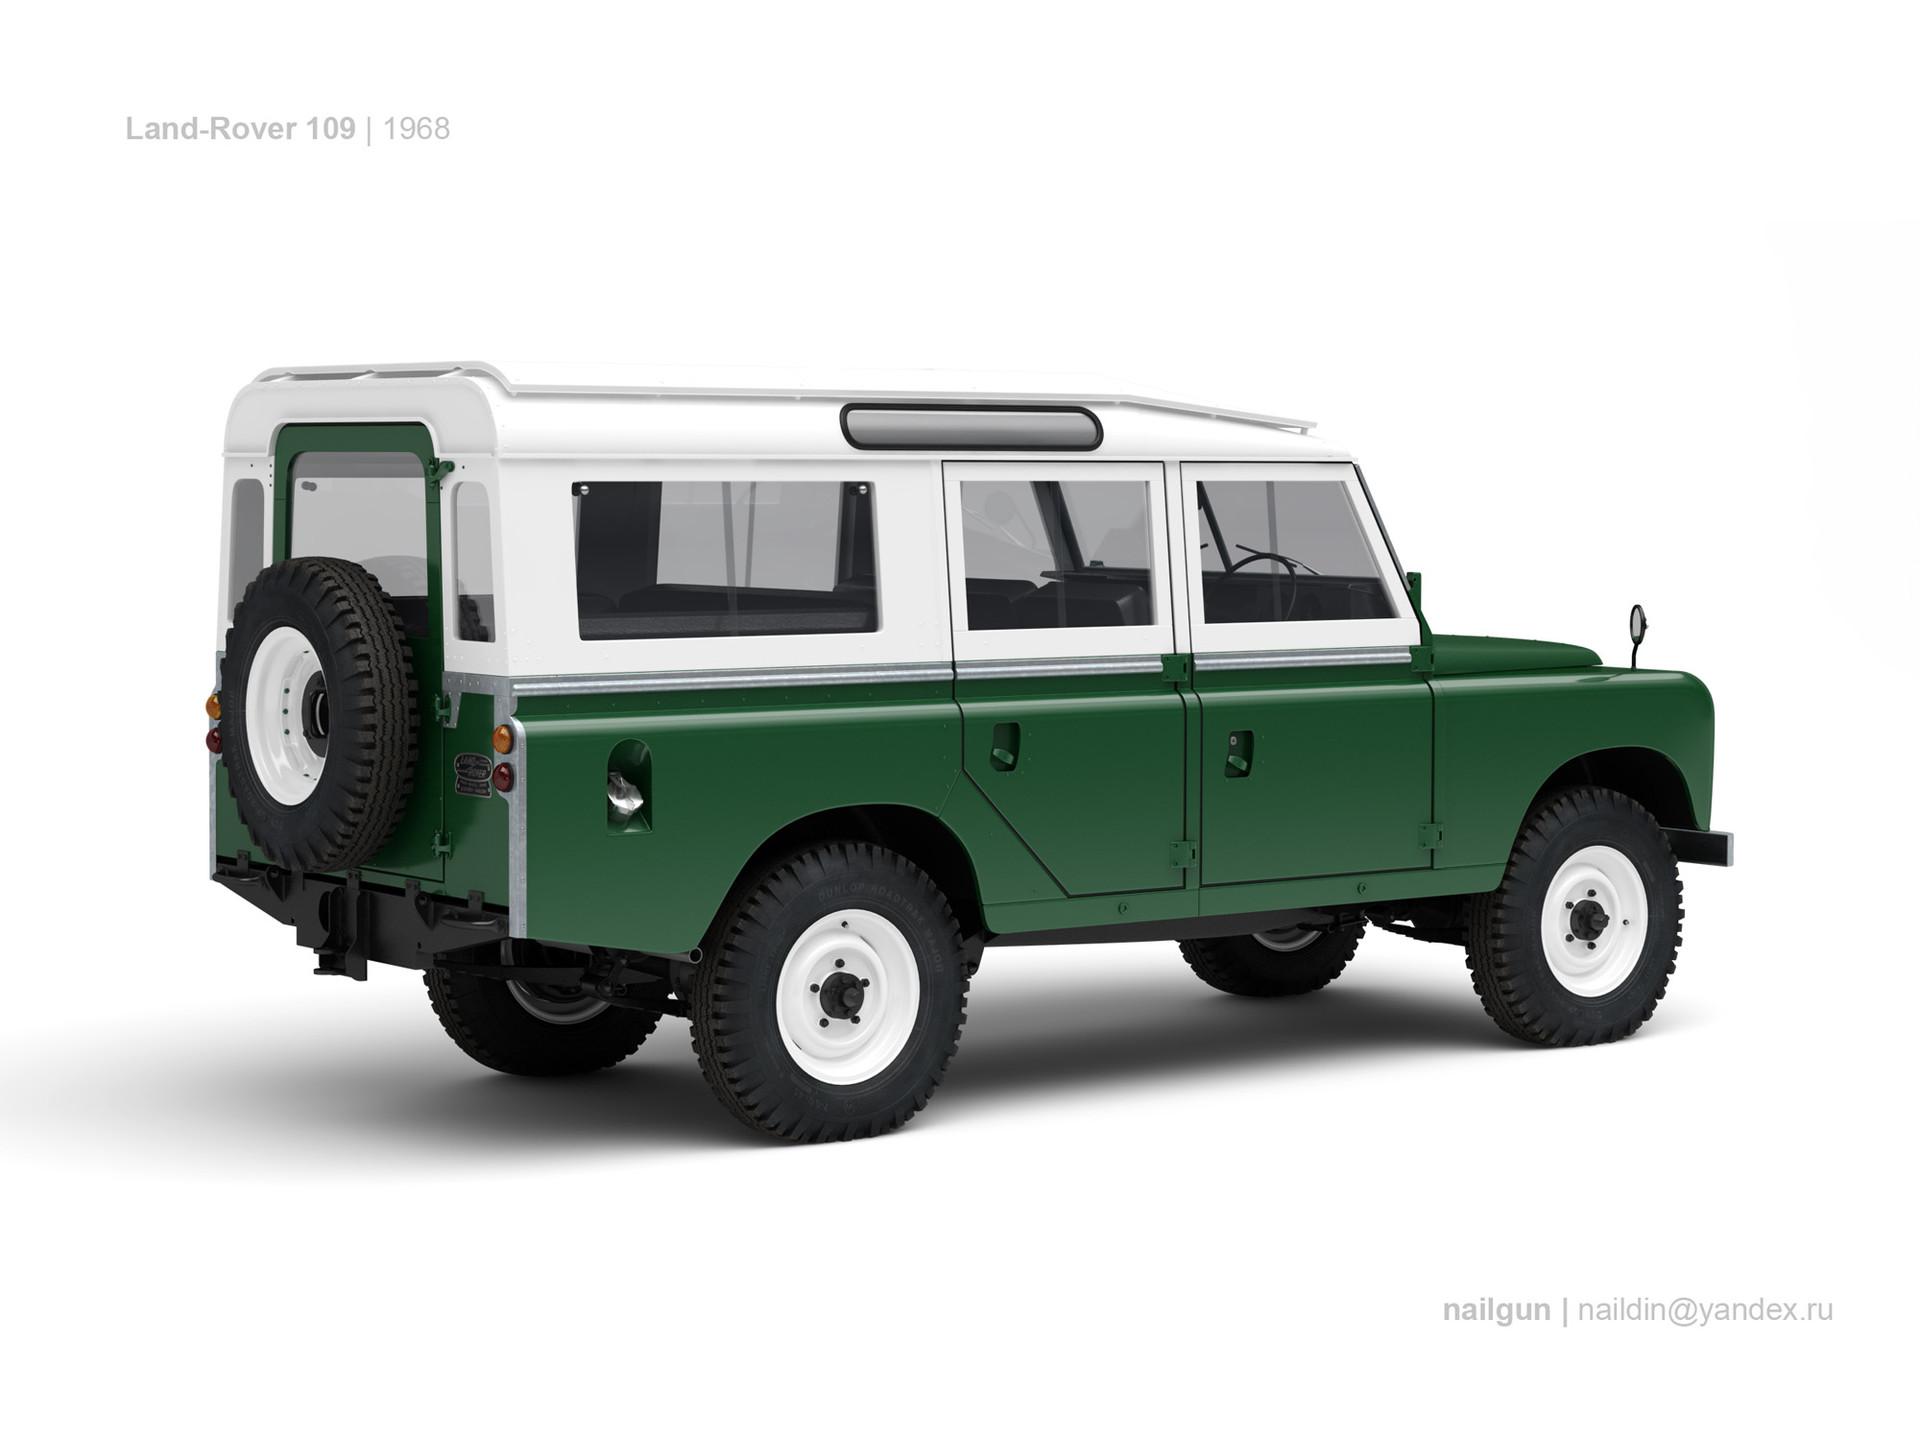 Nail khusnutdinov gb land rover 109 1968 1